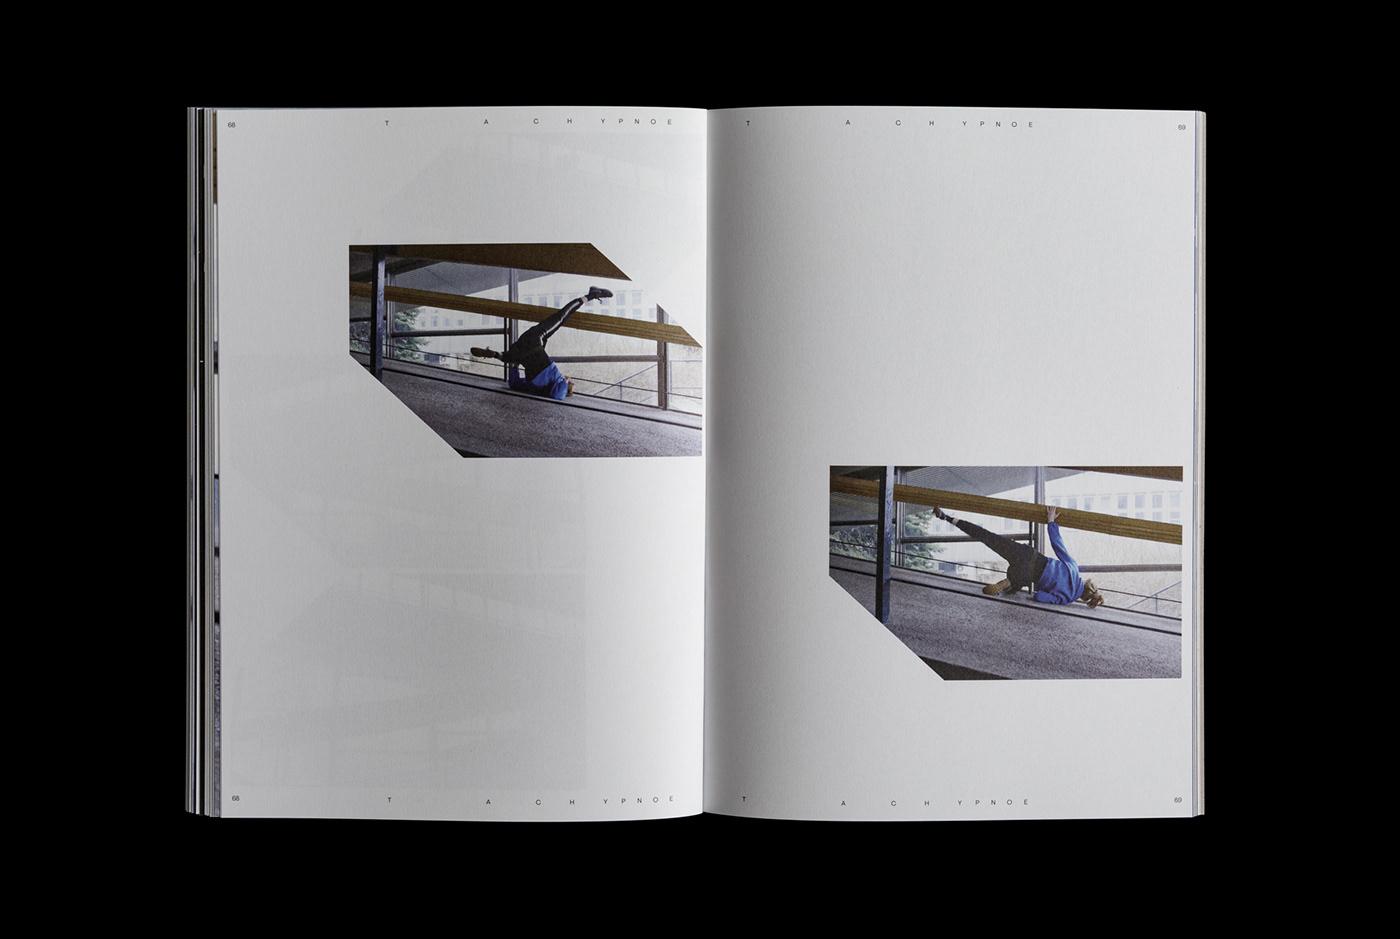 artbook Bookdesign Catalogue editorialdesign graphic graphicdesign layoutdesign publication typedesign typography